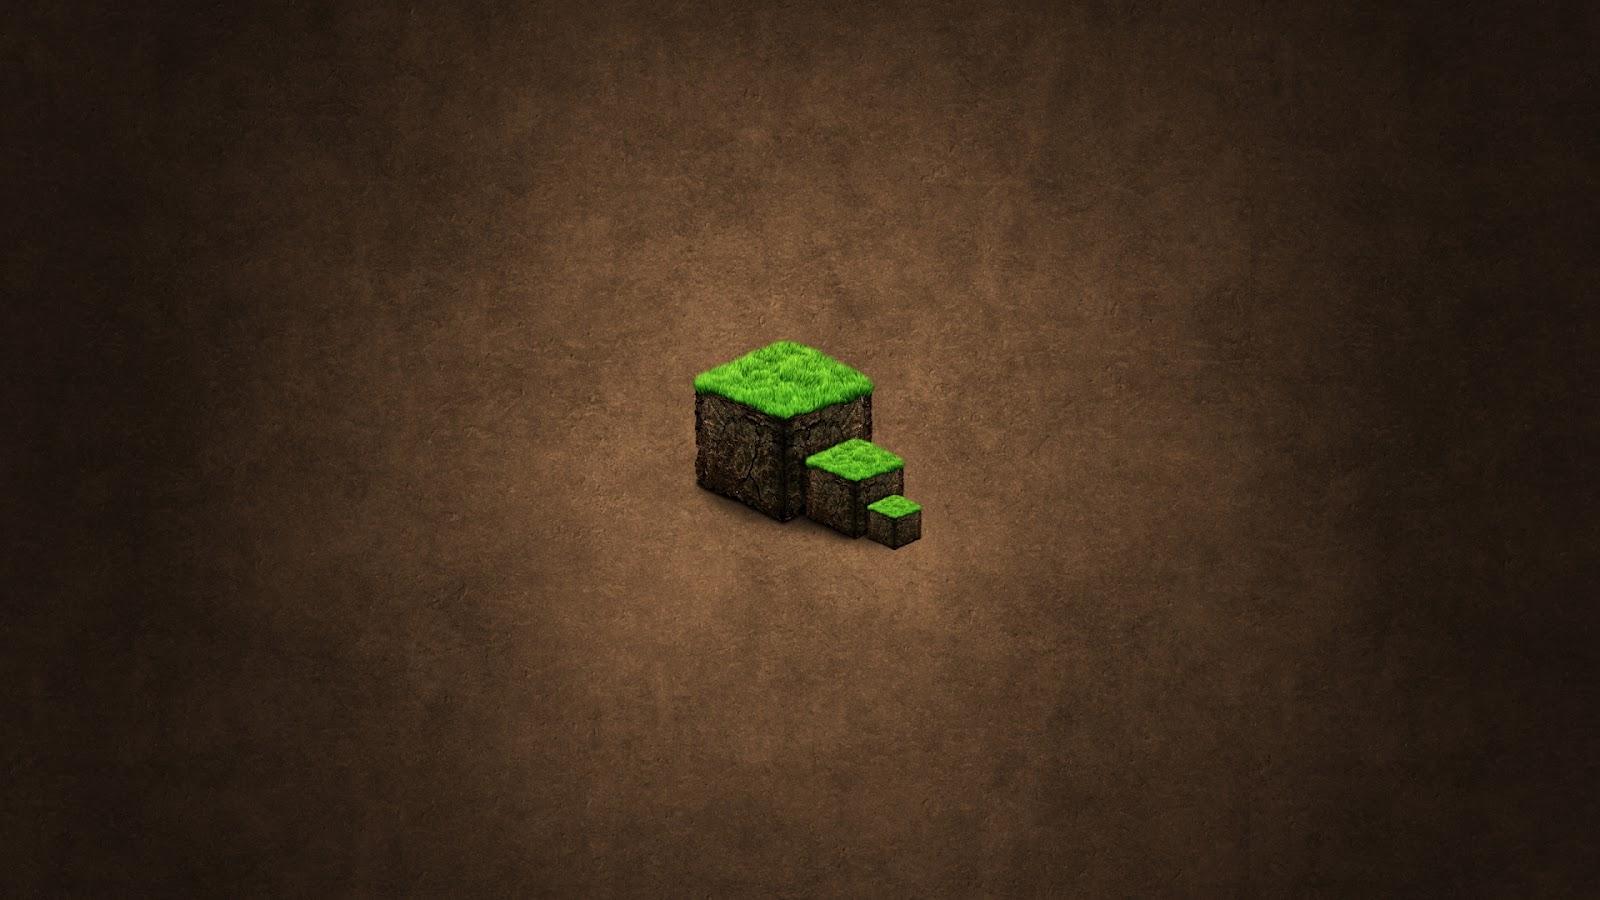 http://1.bp.blogspot.com/-UWmMKI_Woxk/T0lBgO9-IEI/AAAAAAAAAt8/k1QYqfinmV8/s1600/Minecraft_Minimal_HD_Wallpaper_gWb.jpg